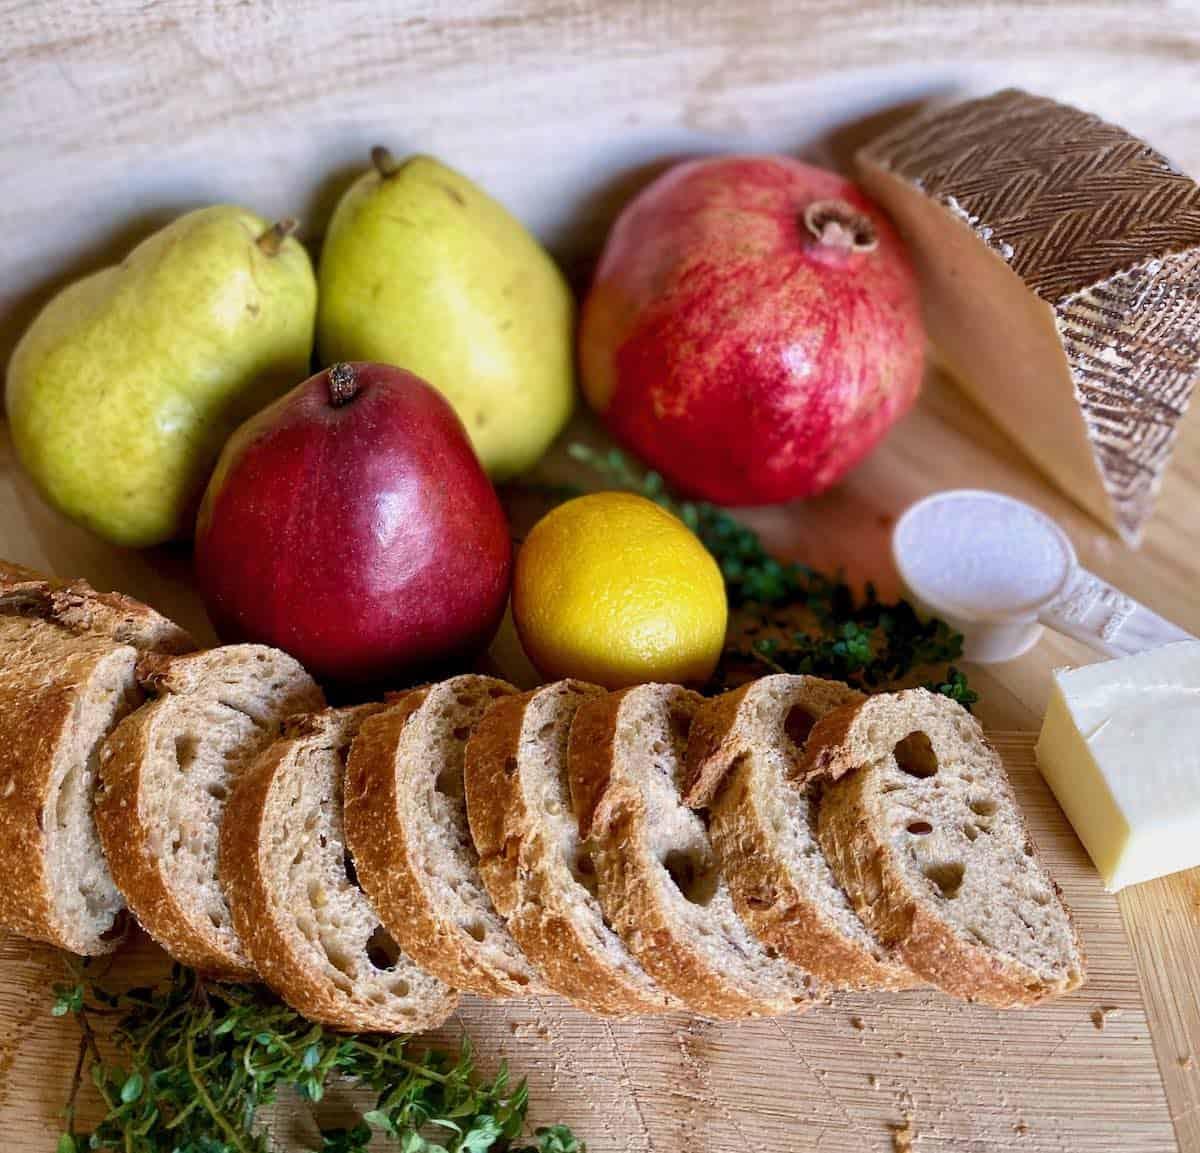 pear crostini recipe ingredients: pears, bread, cheese, pomegranate, thyme, sugar, lemon